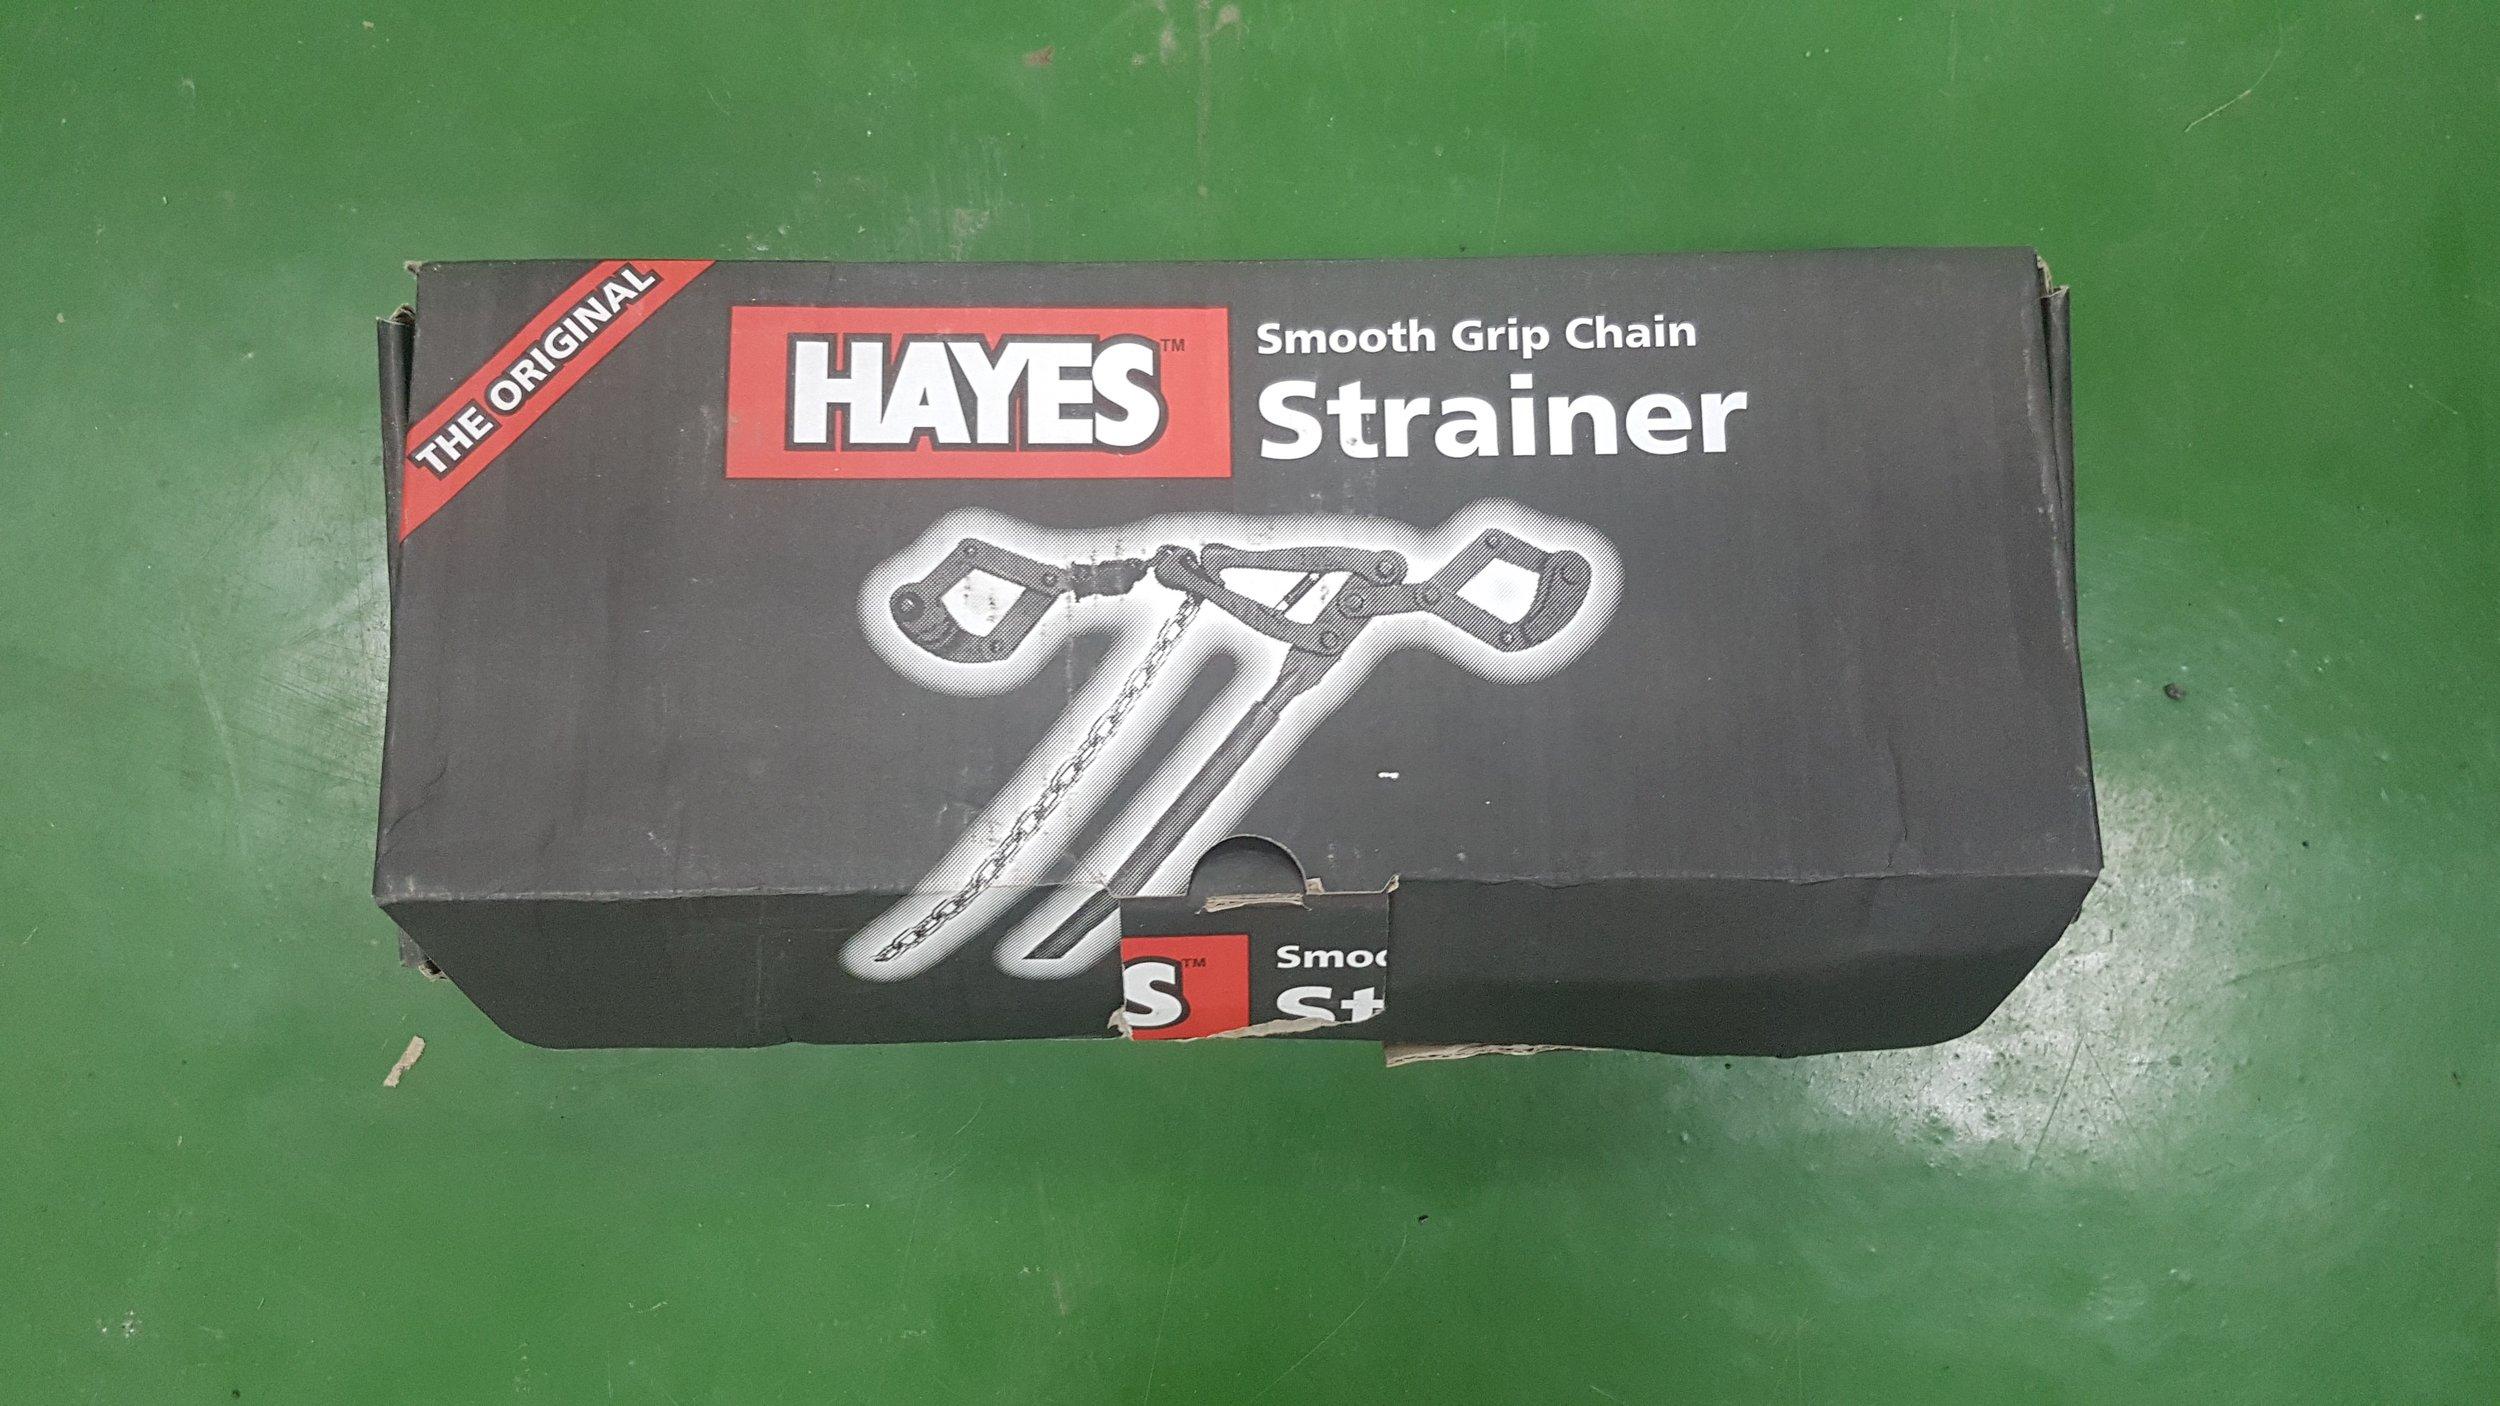 Hayes smooth grip strainer.jpg